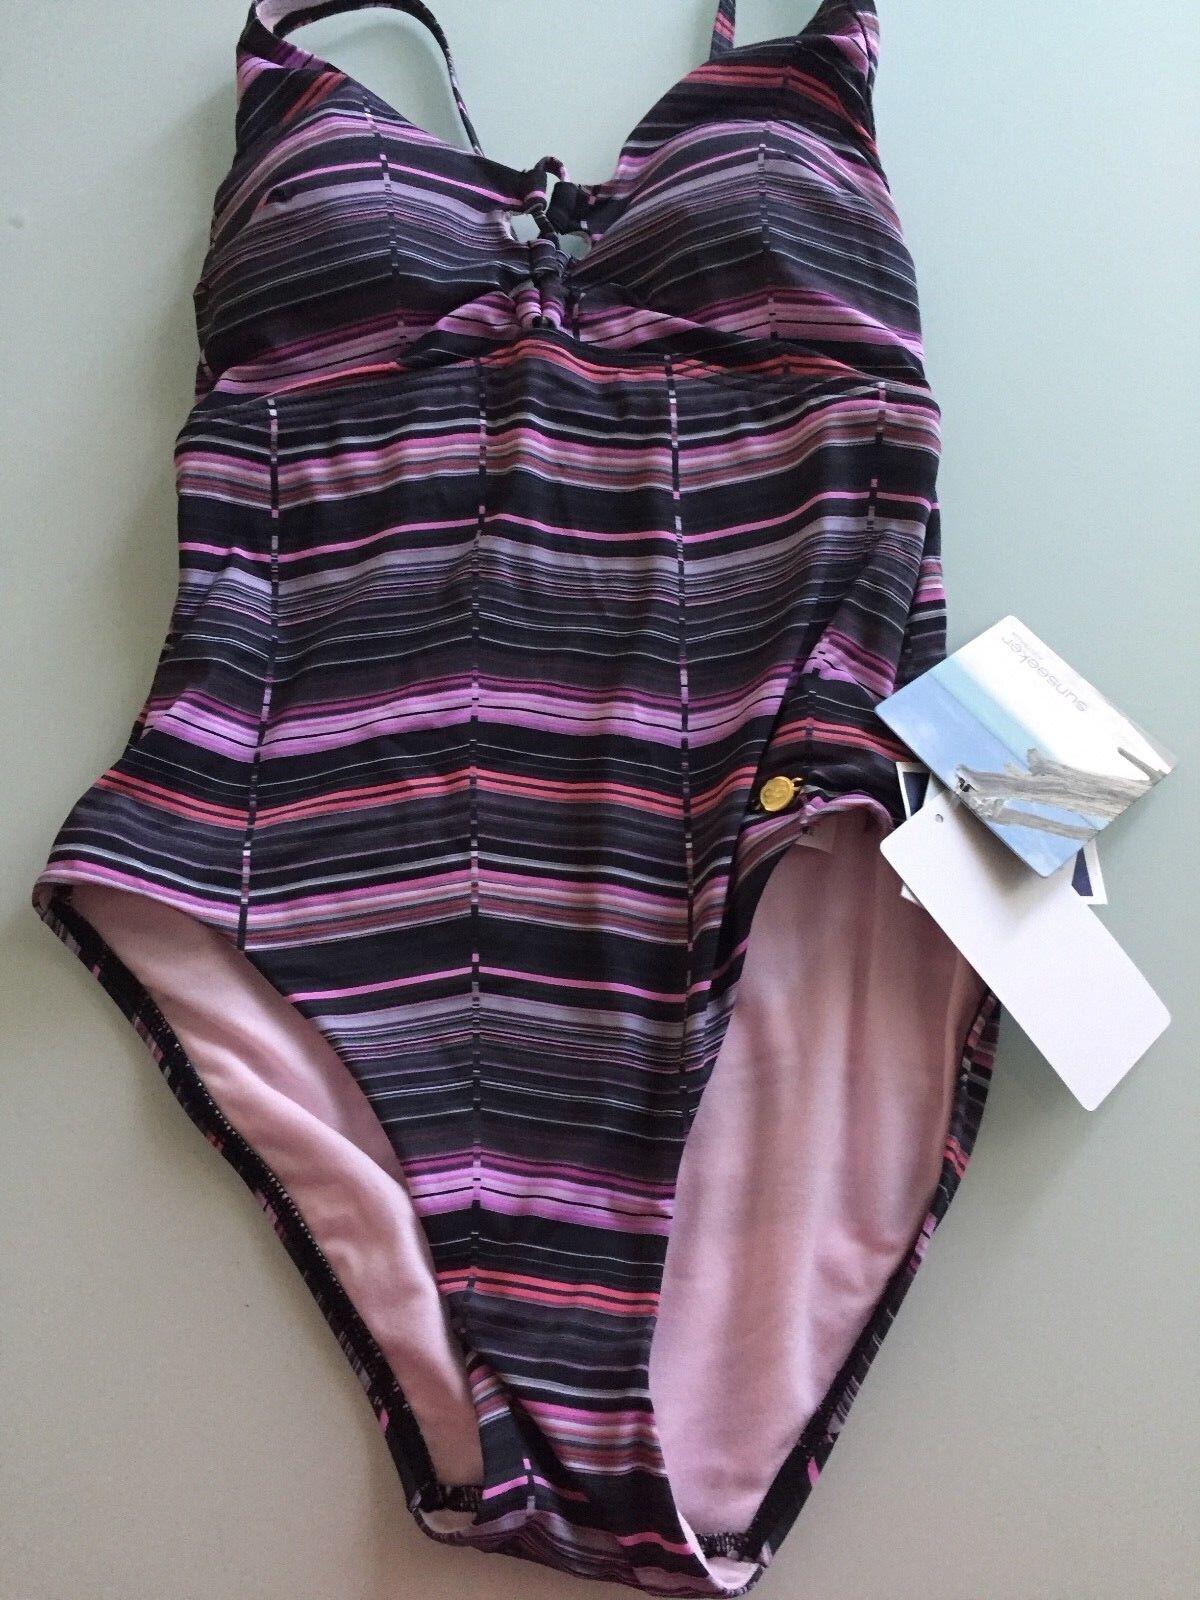 NWT Sunseeker Women Swim Suit Size 4 USAstyle 1180072. Multi purple color.  New